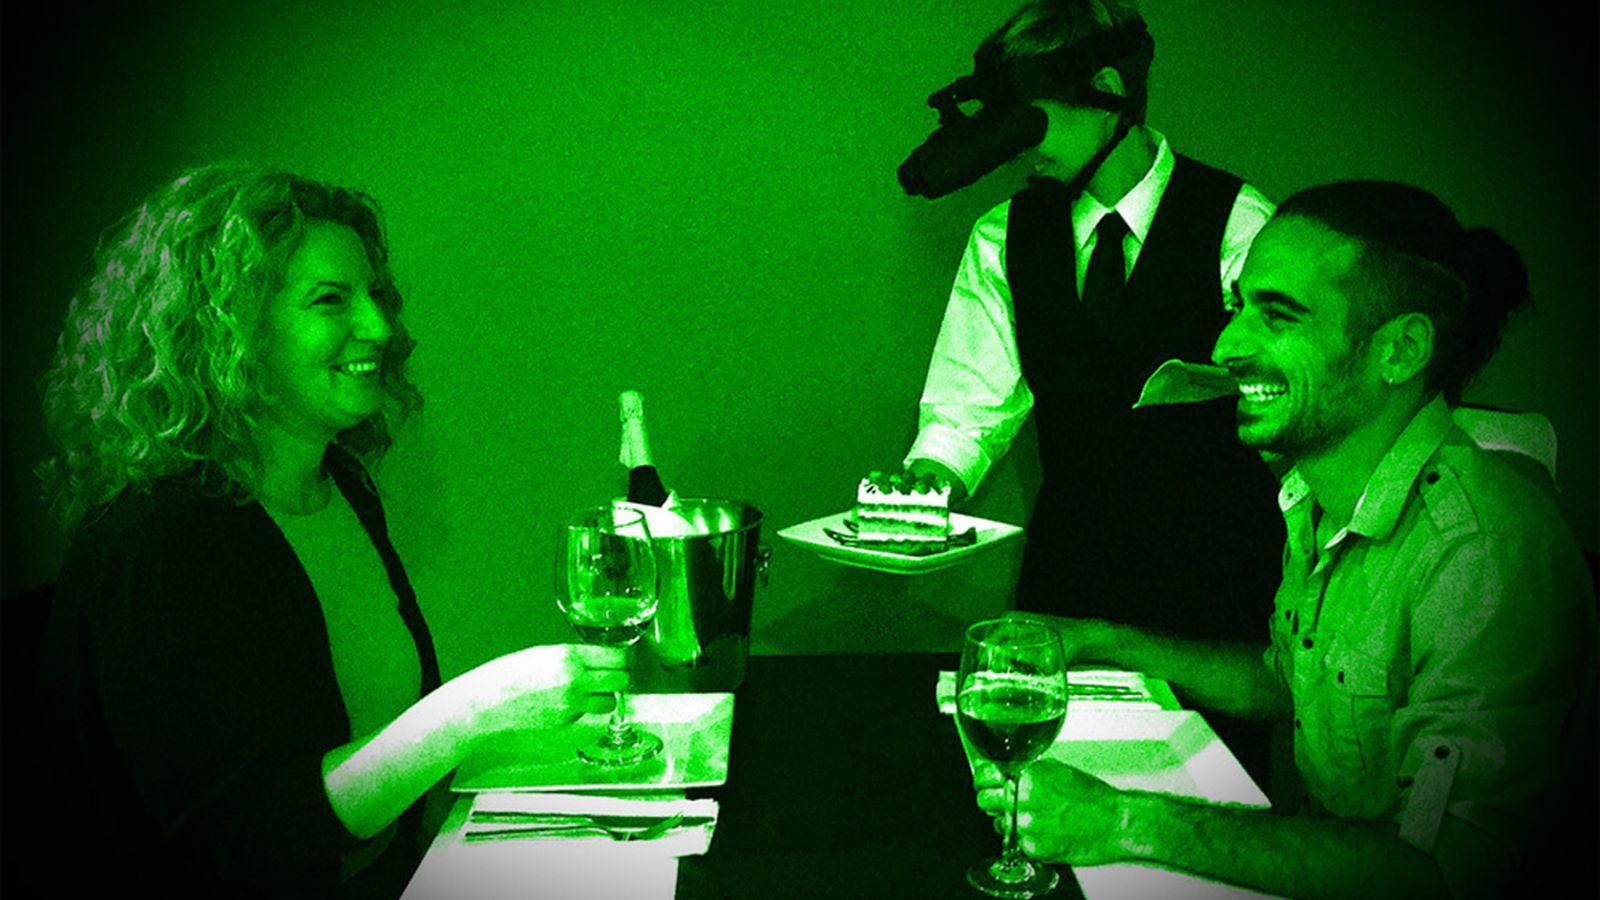 Blackout_Dining_in_the_Dark_6_11.0.jpg